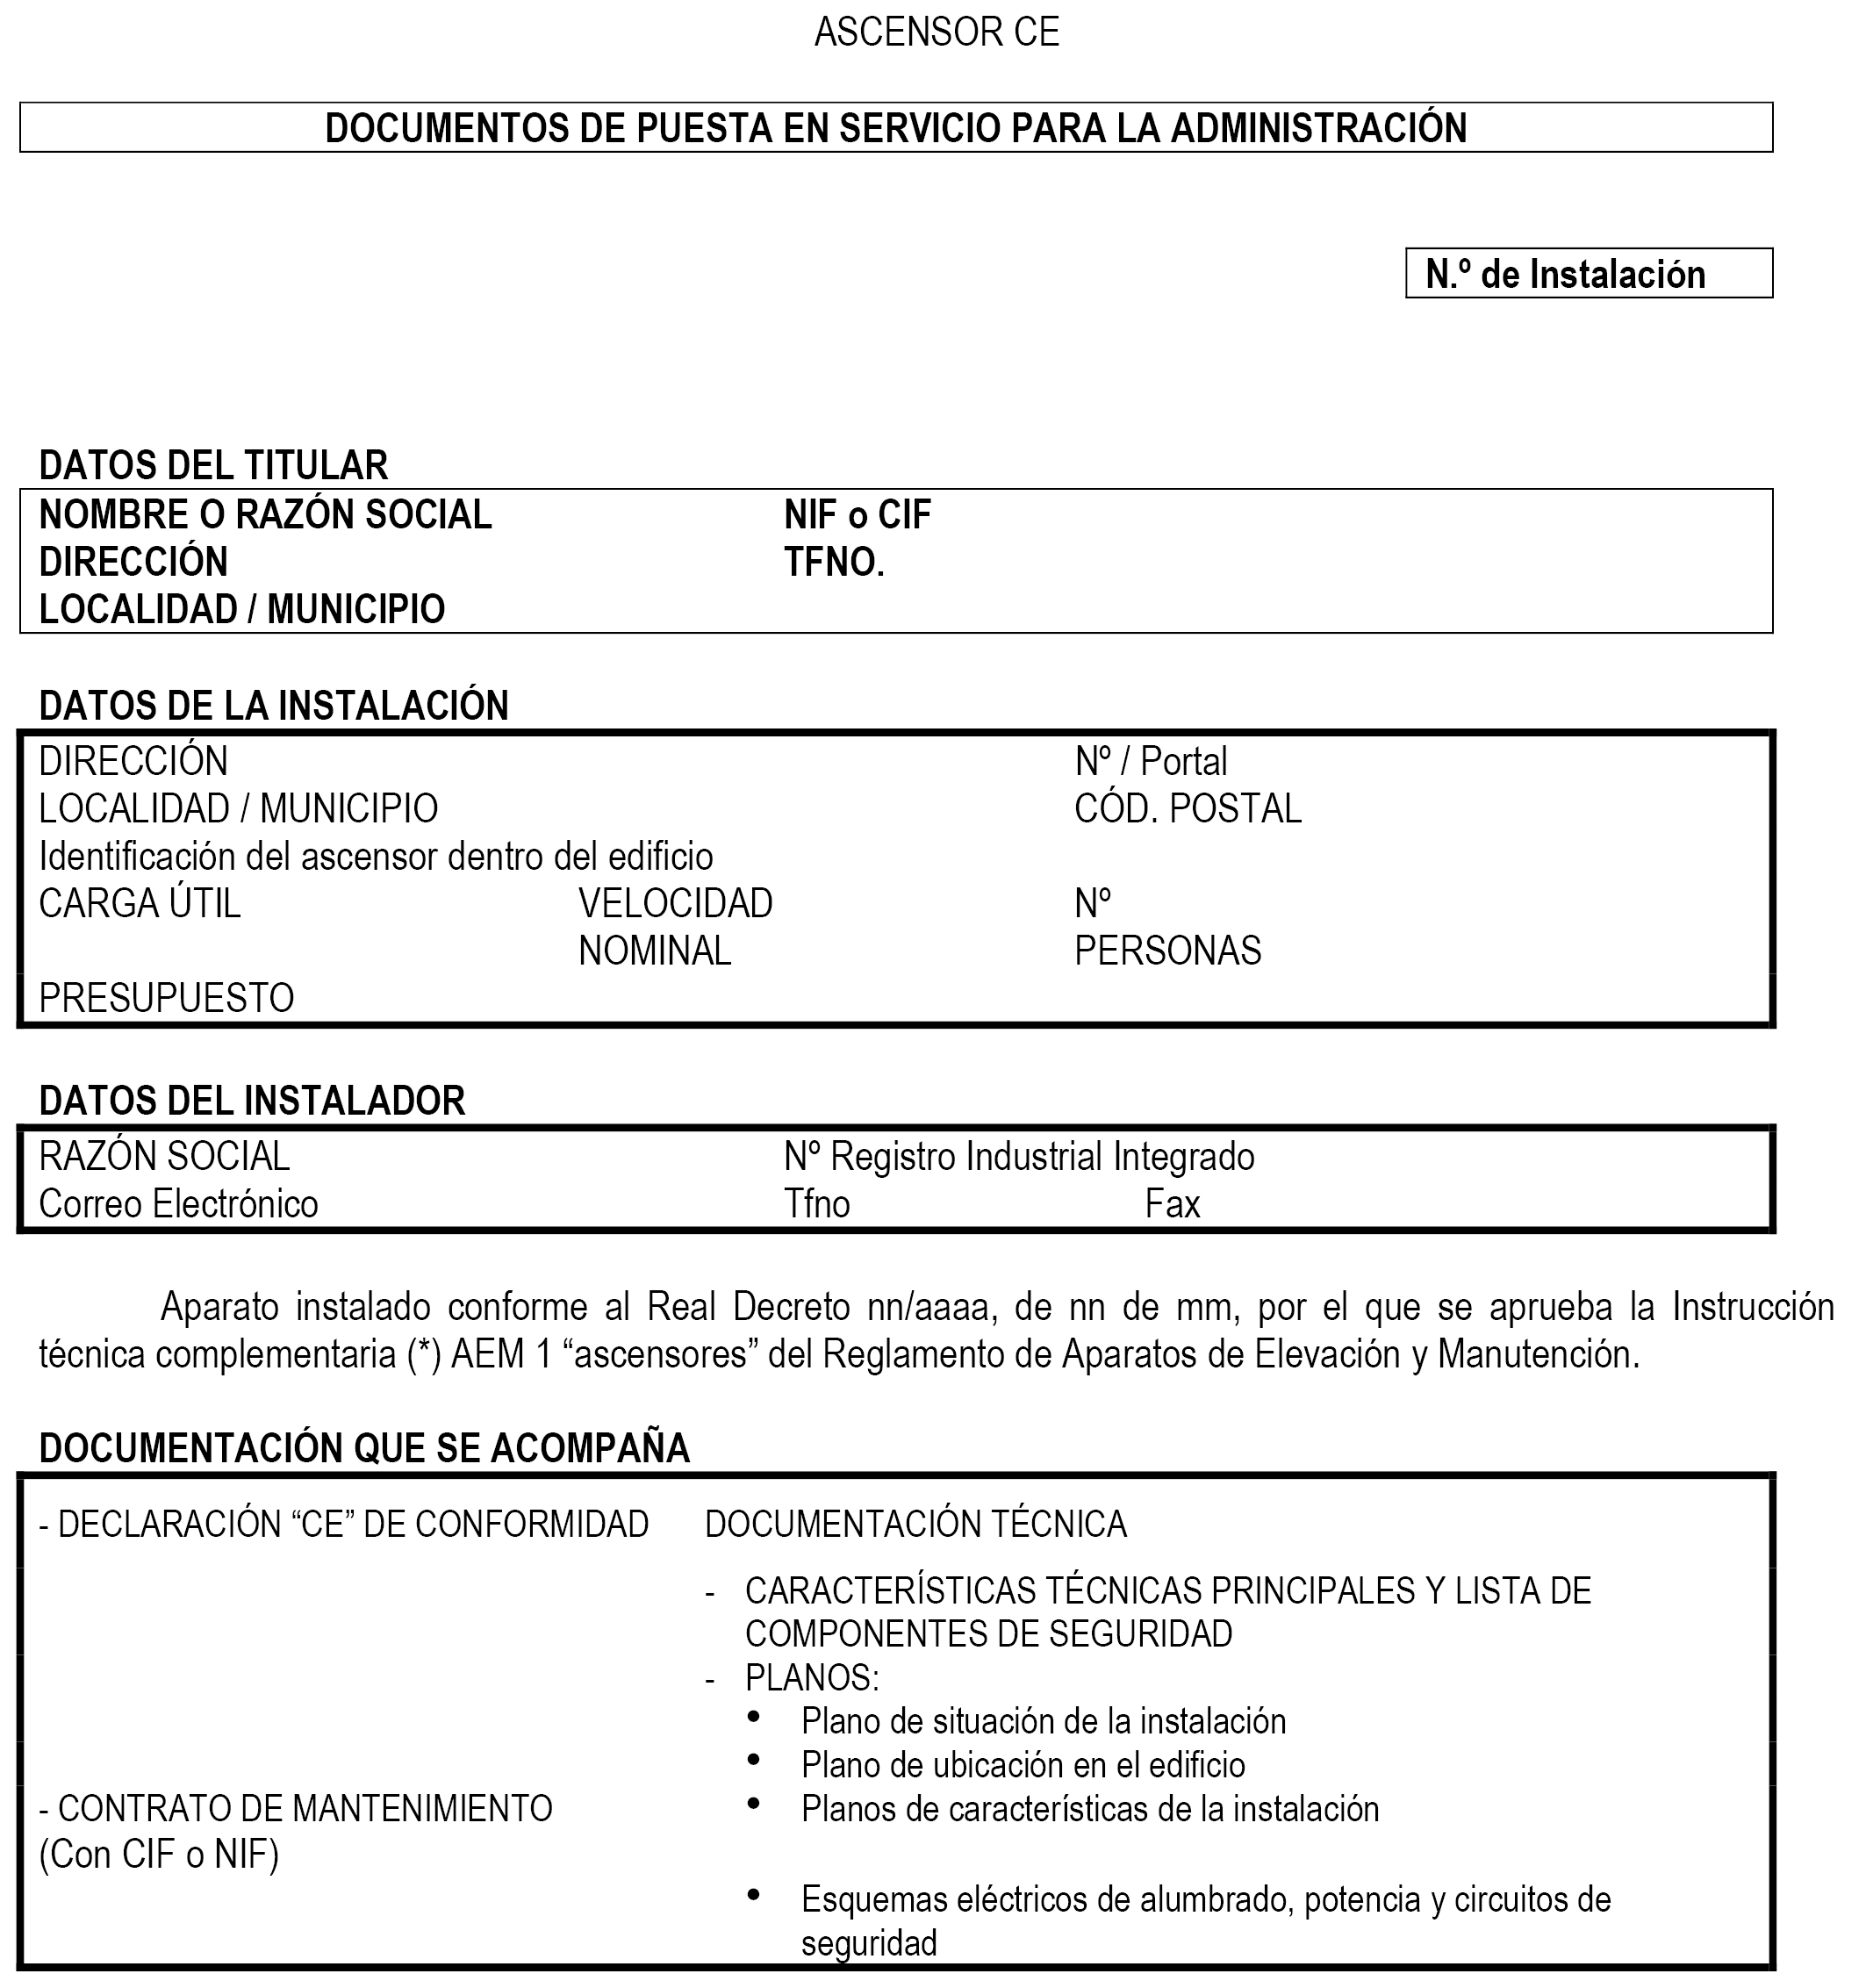 BOE.es - Documento BOE-A-2013-1969